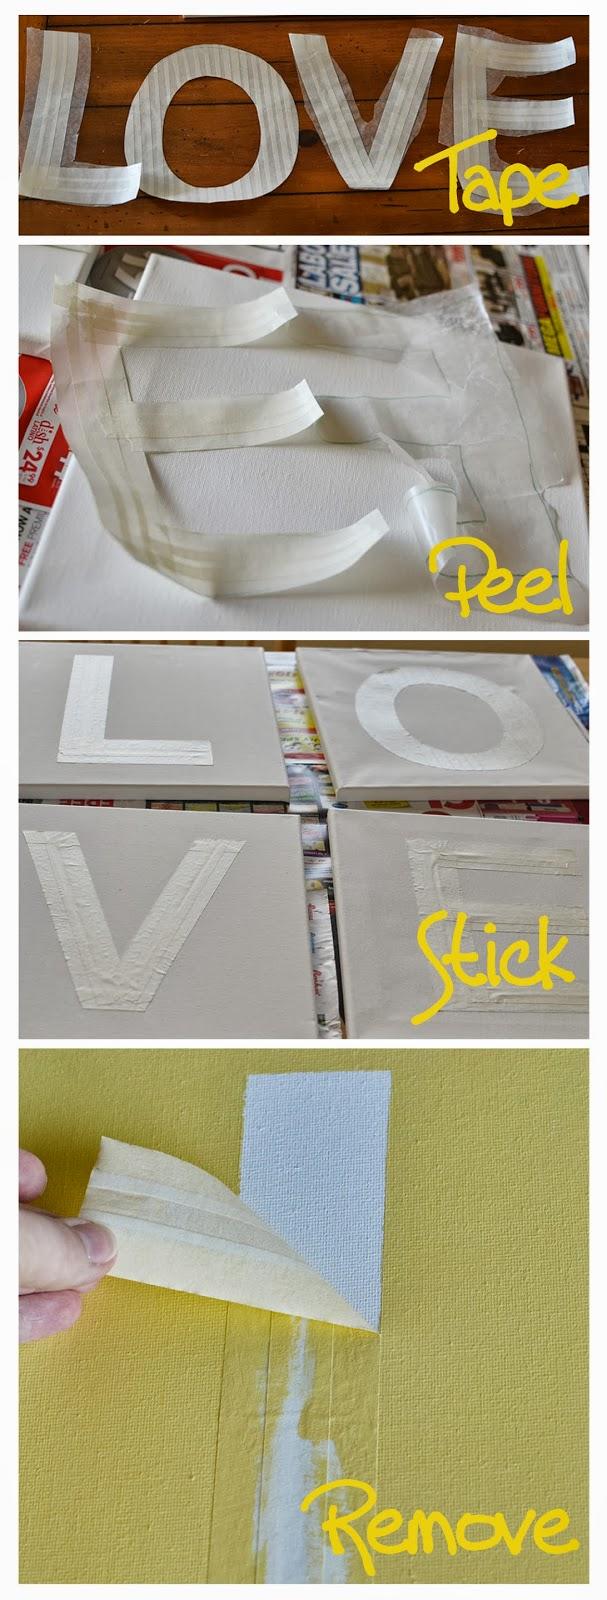 puddle designs  diy large letter stencils